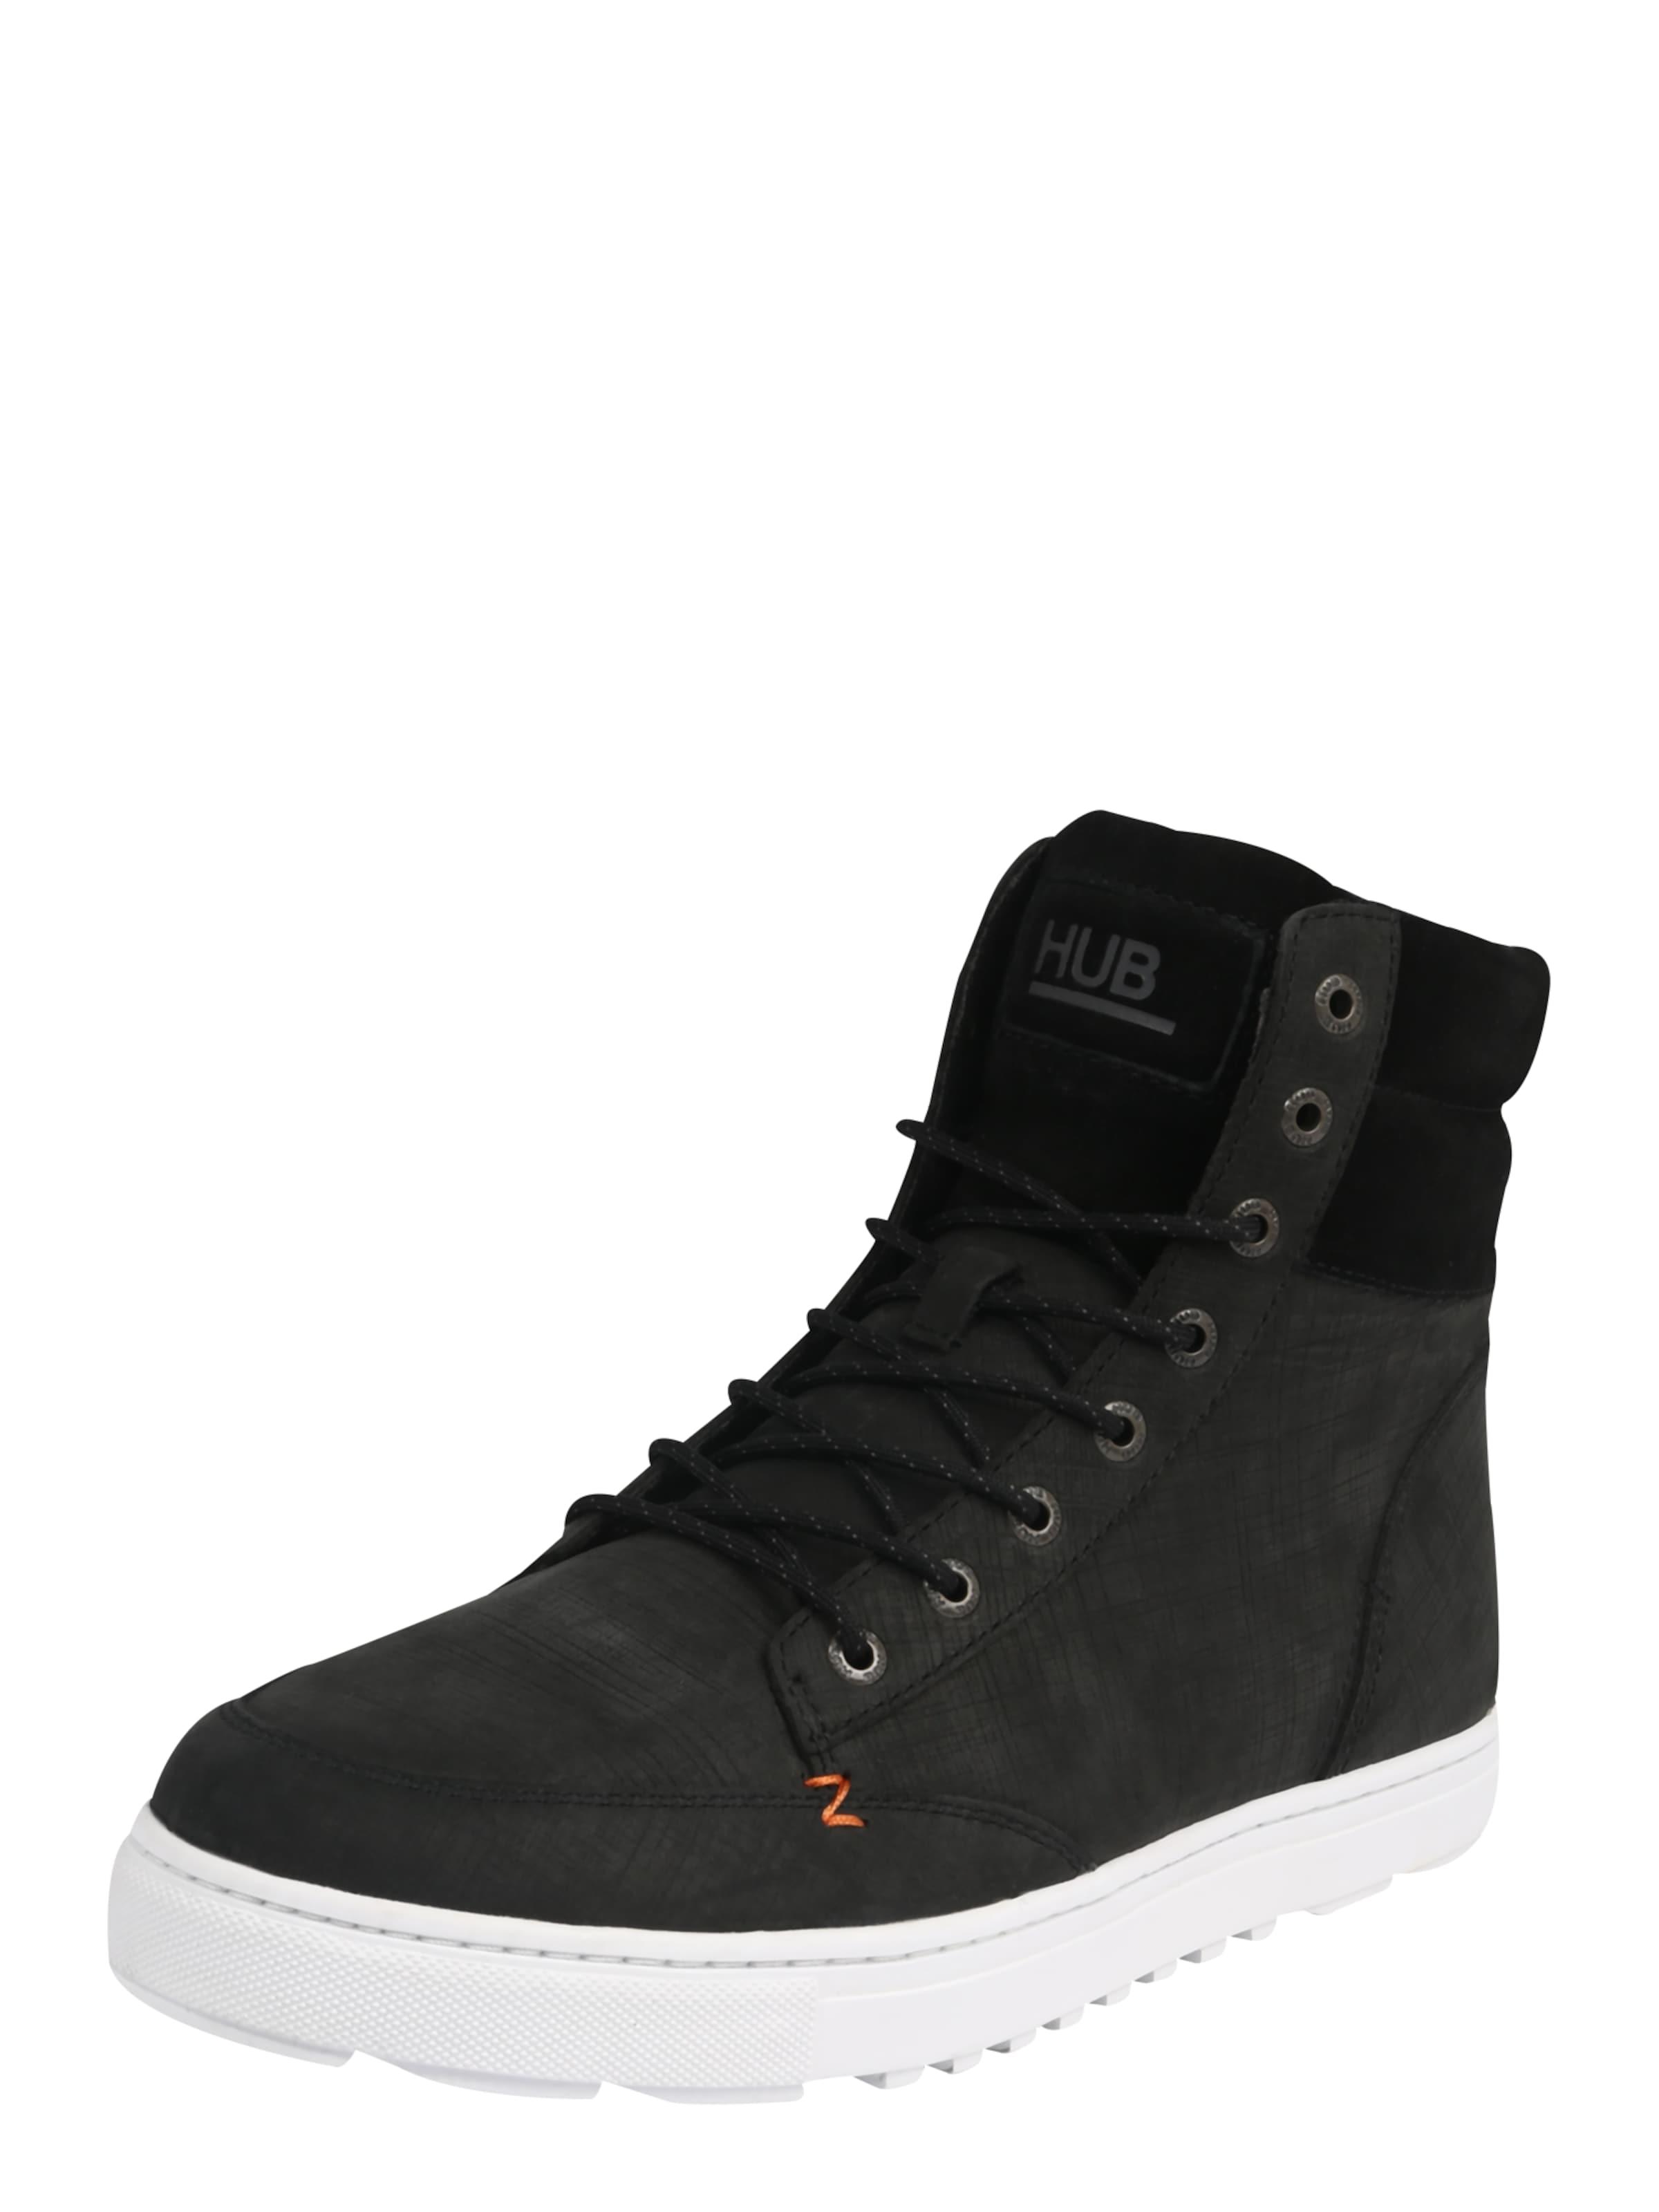 HUB Sneaker  Dublin N33